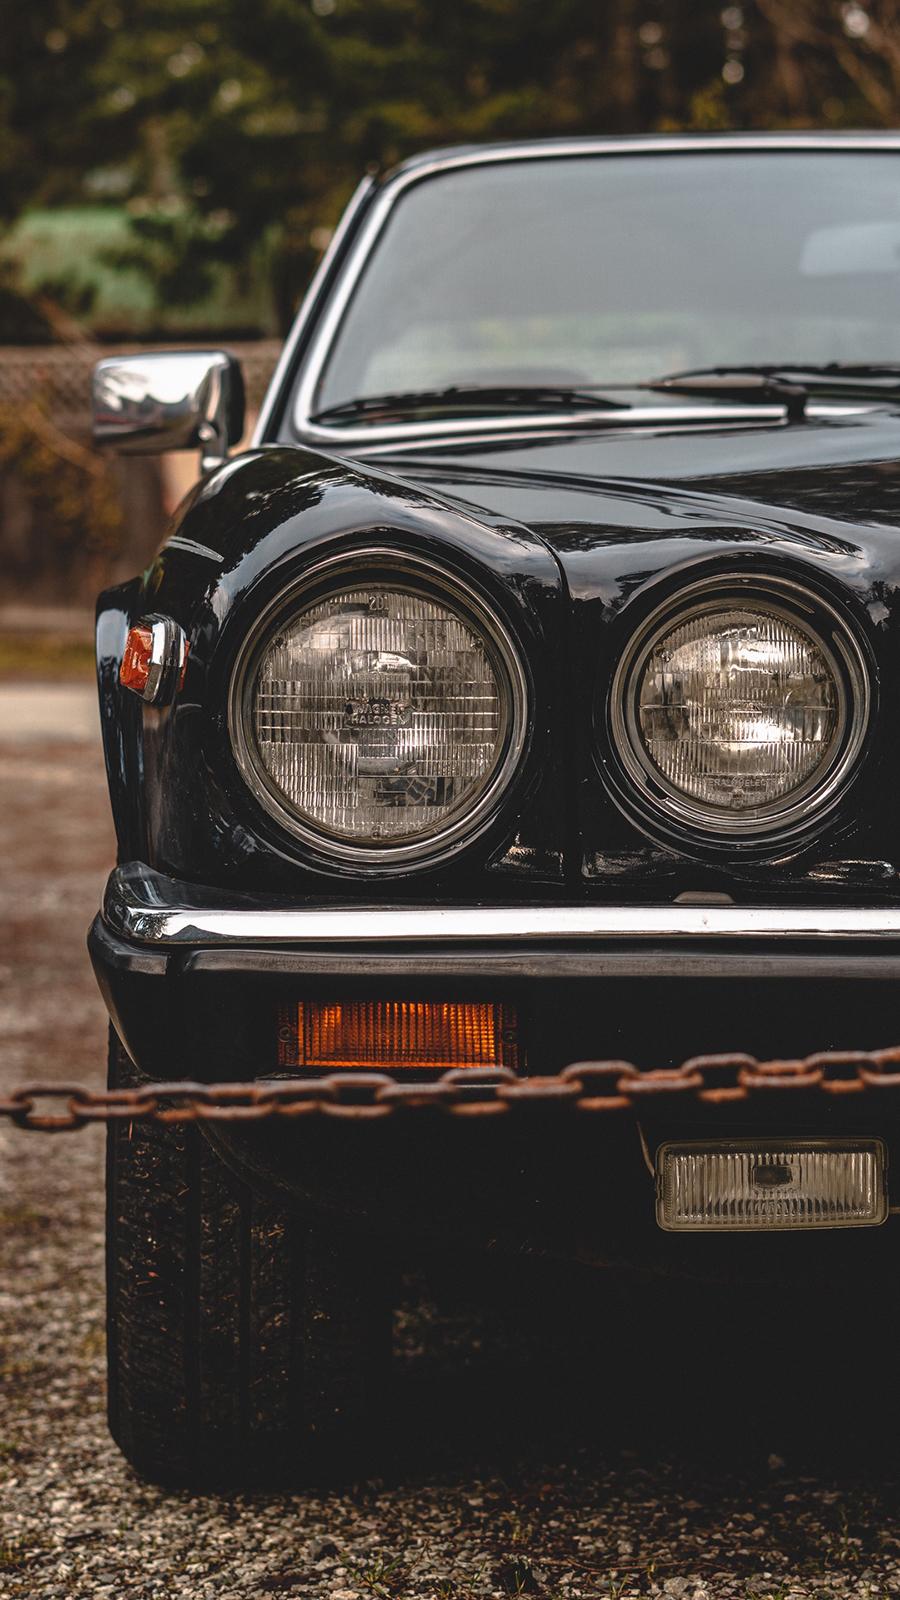 Retro Car Full HD Wallpapers Free Download